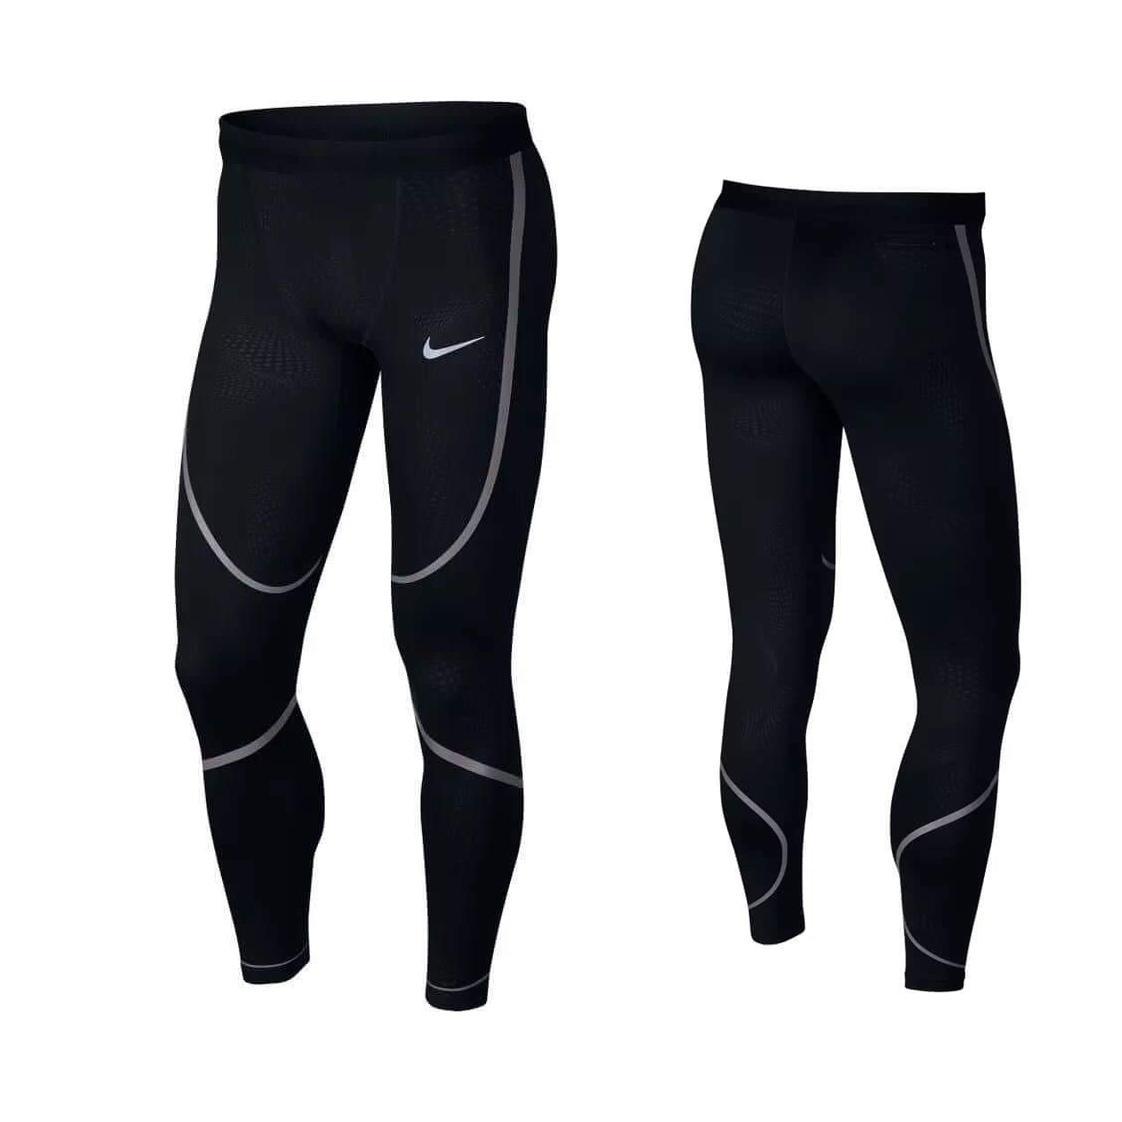 aza.706-Camoflage NK Compression Cool Dry Sports Tights Pants Baselayer Running Leggings Yoga